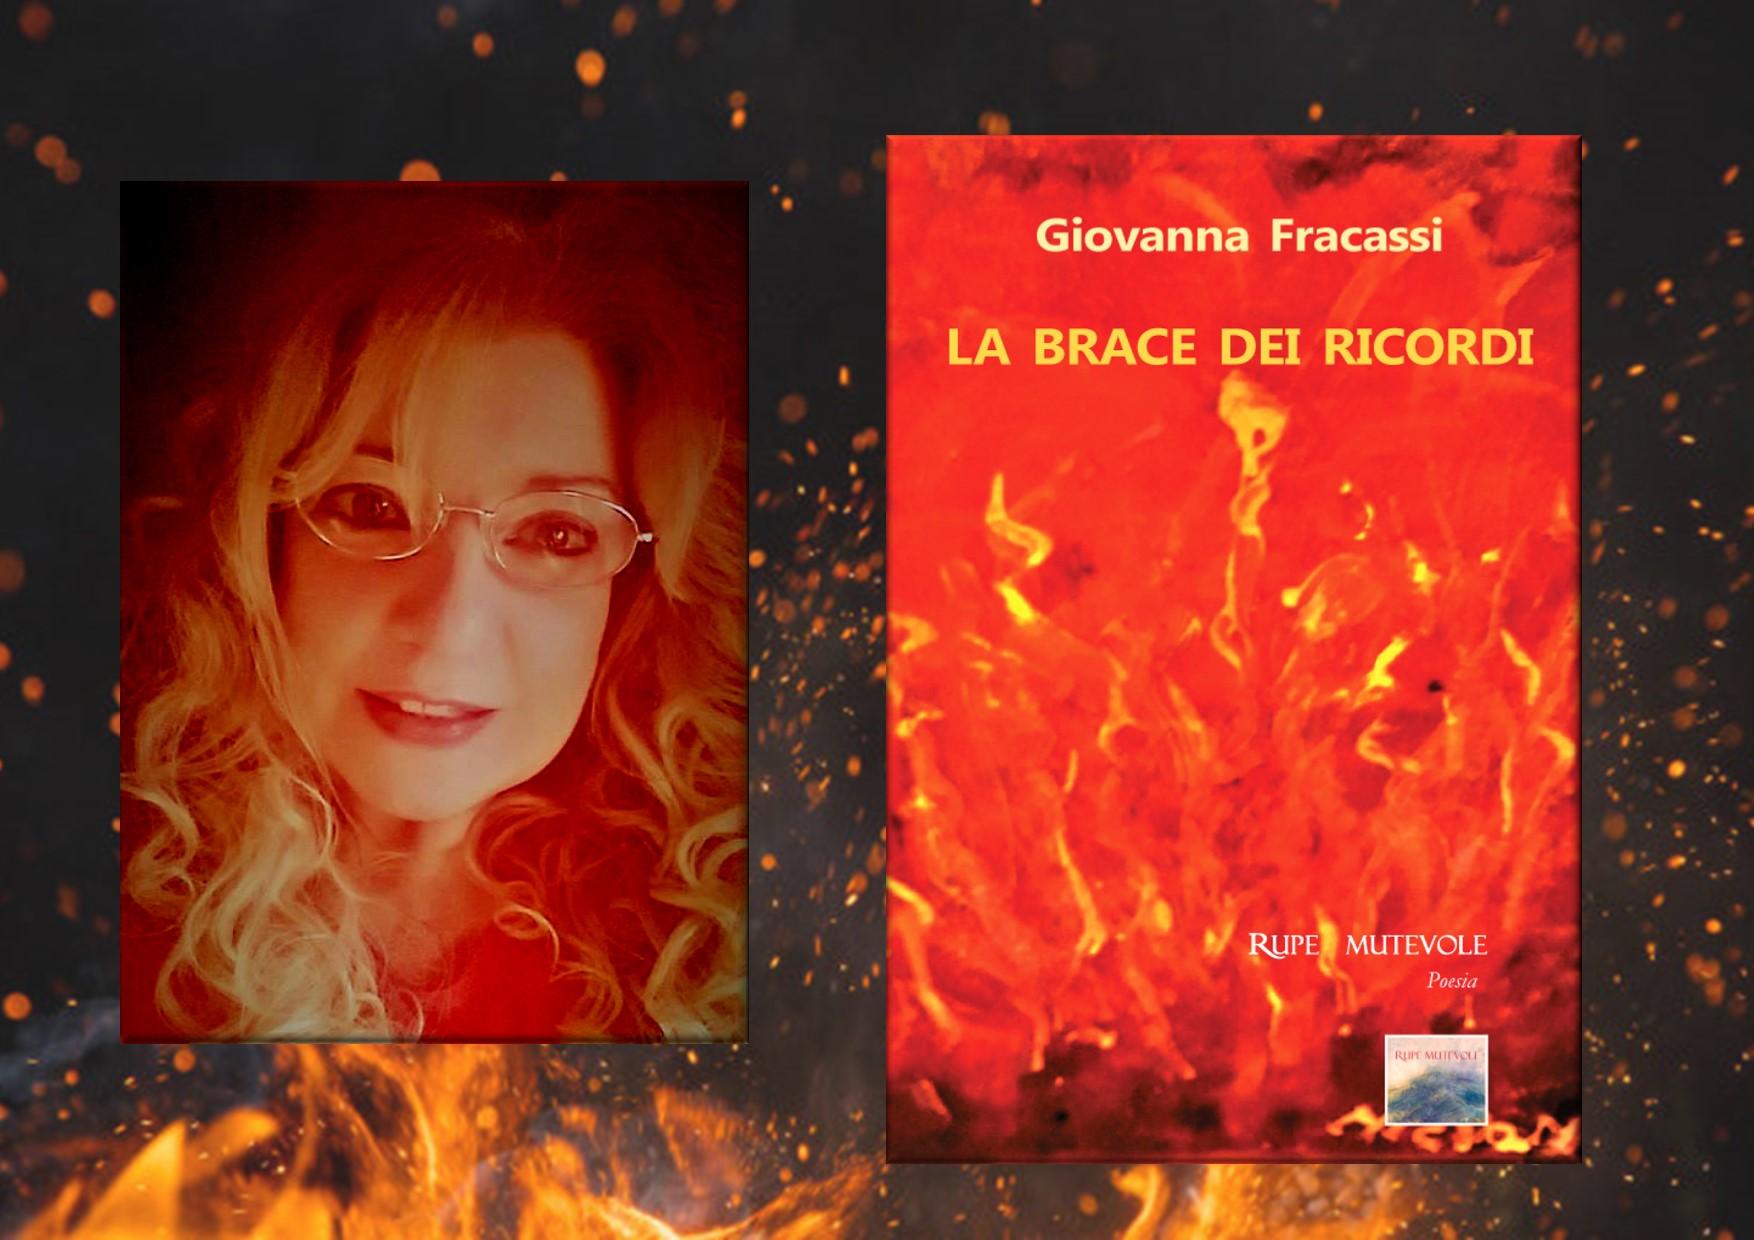 La brace dei ricordi – Giovanna Fracassi